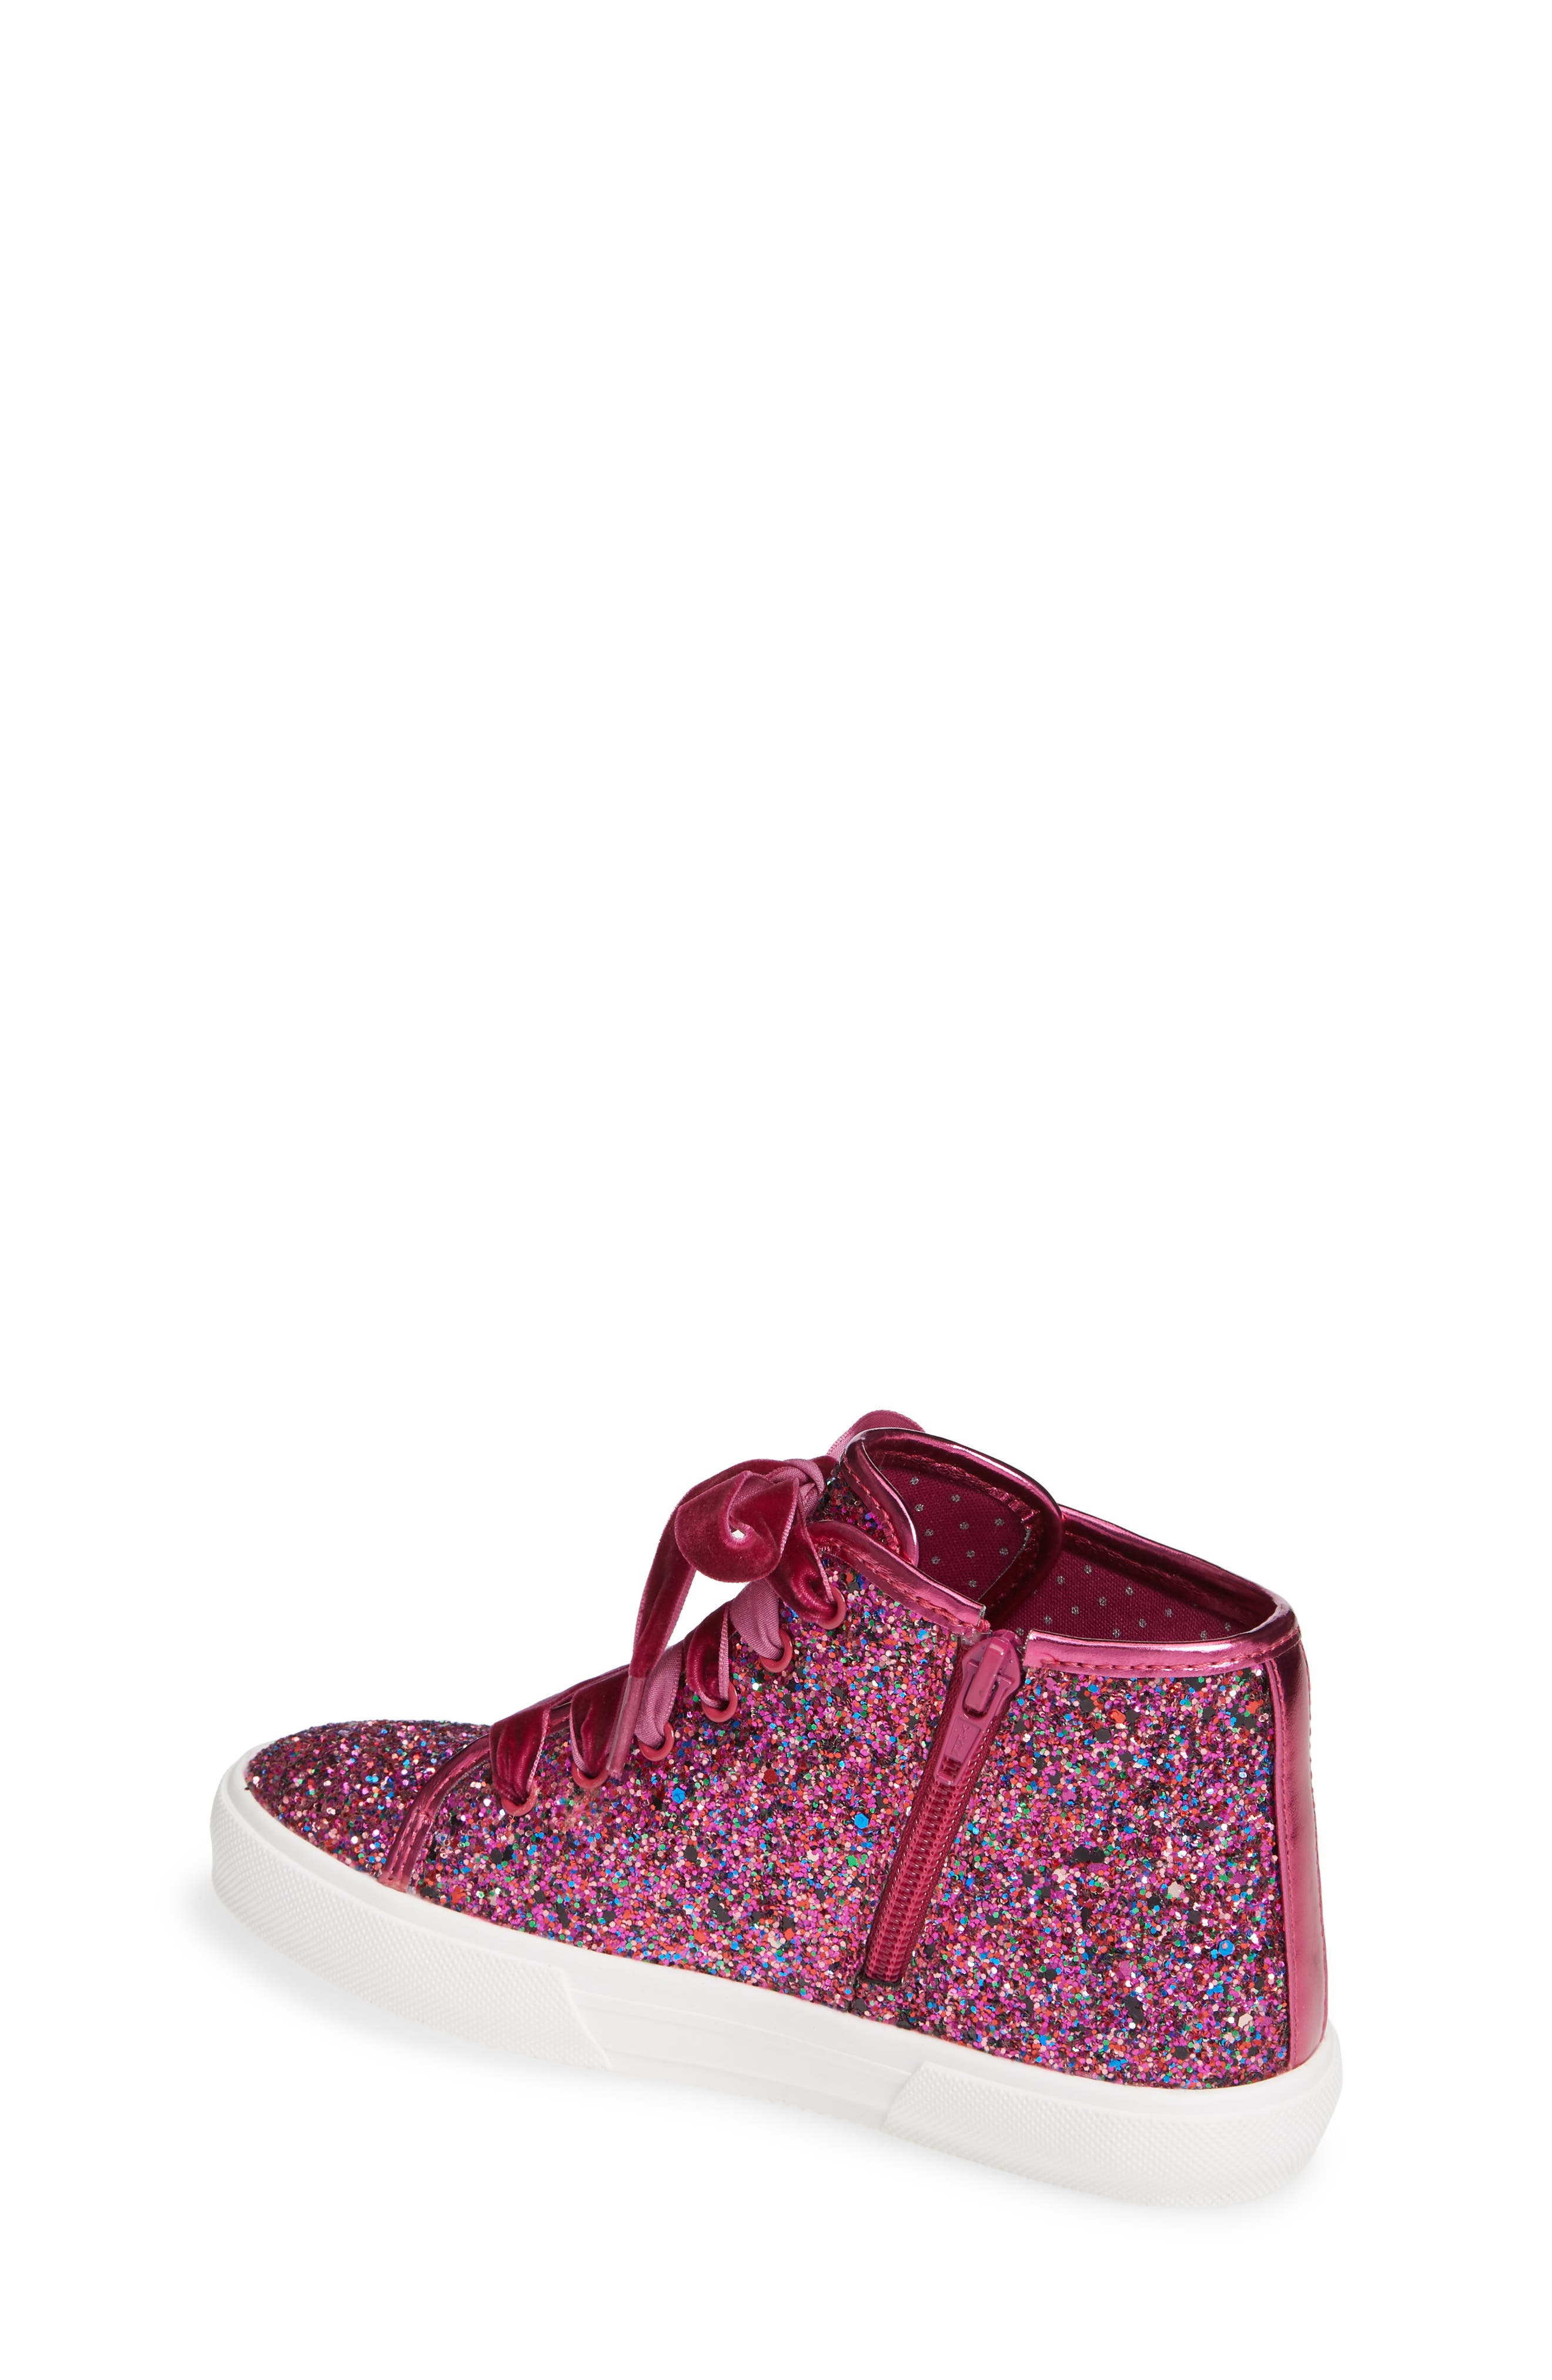 TUCKER + TATE, Skylar Glitter Sneaker, Alternate thumbnail 2, color, FUSCHIA MULTI GLITTER PU